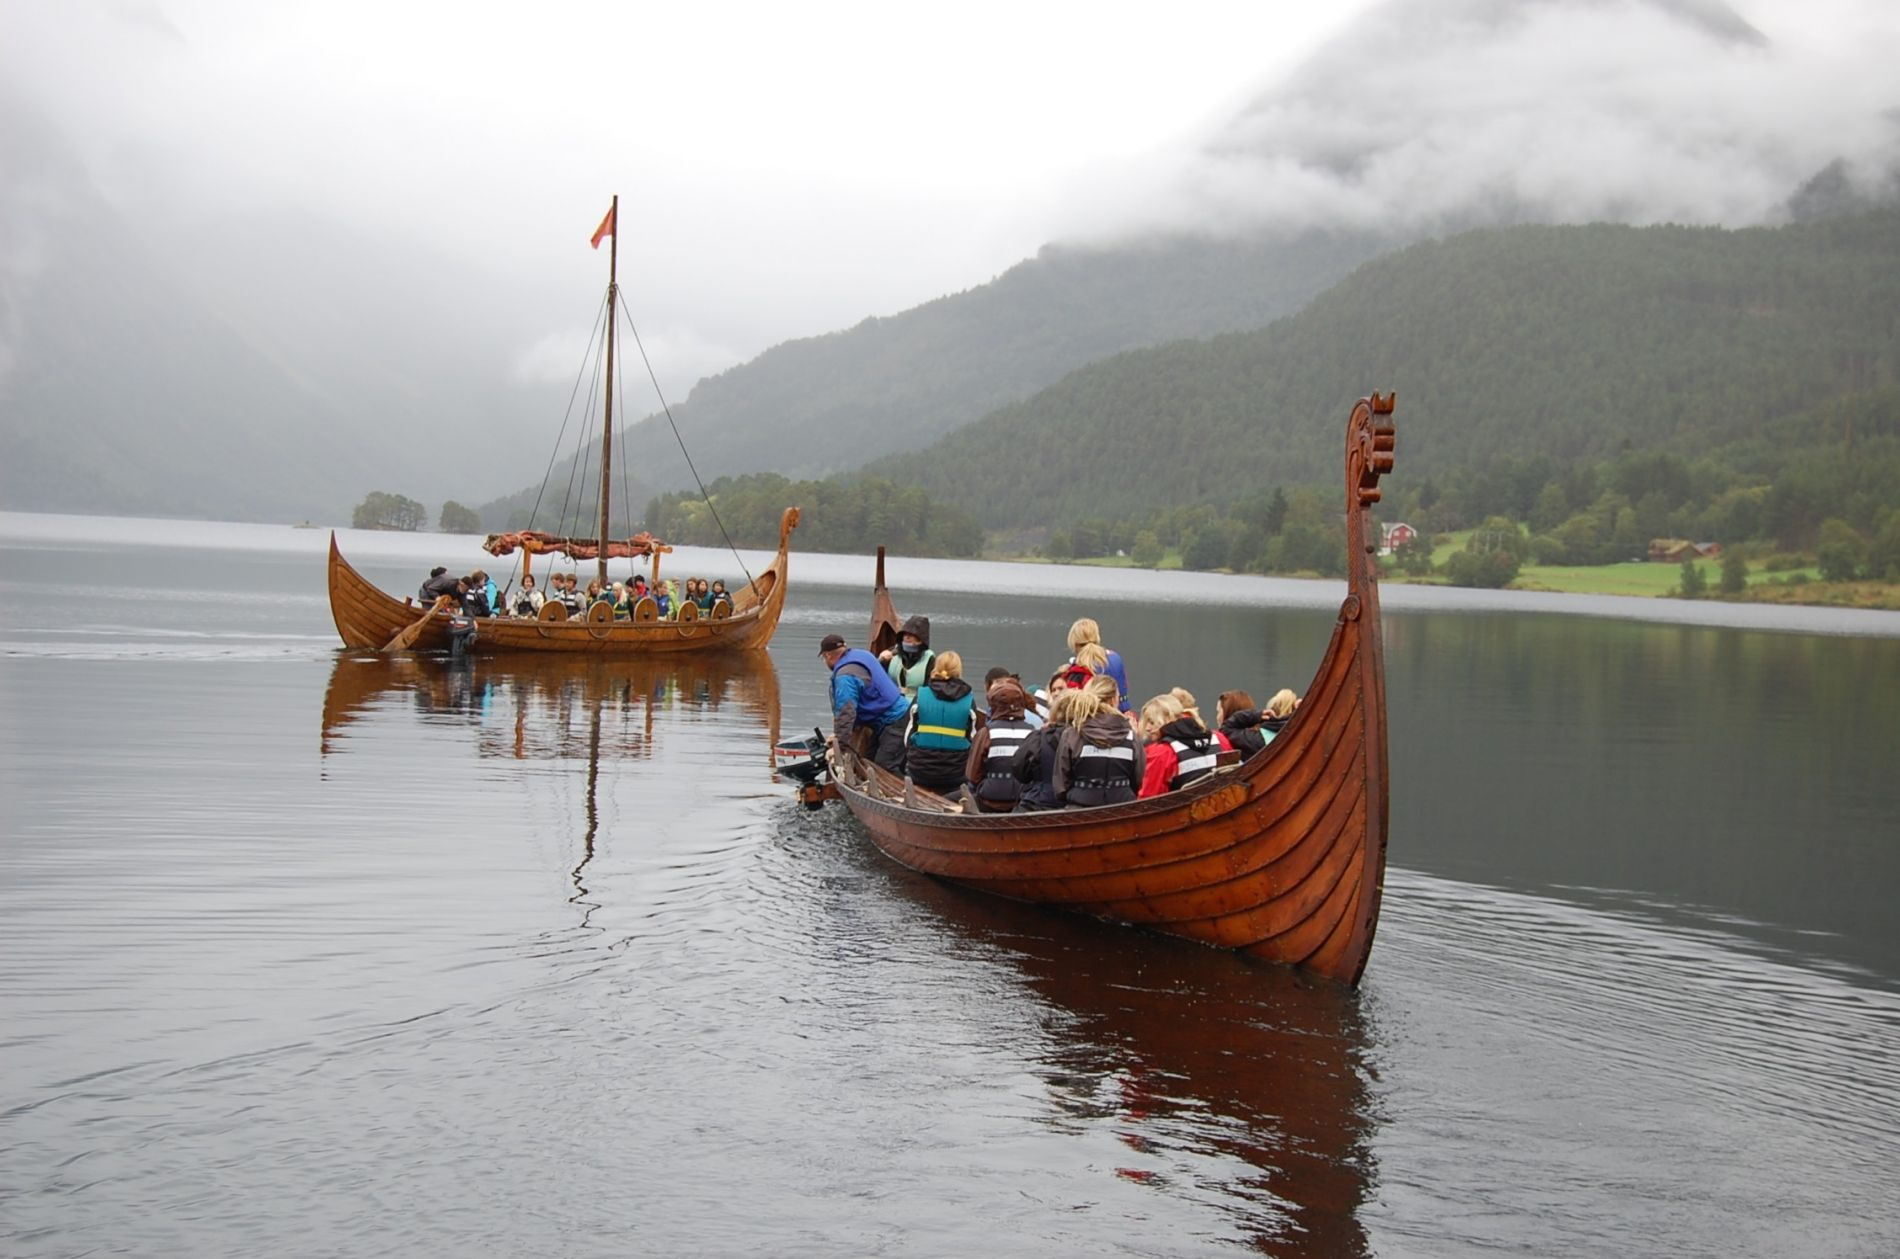 Fjordane folkehogskule viking.jpg